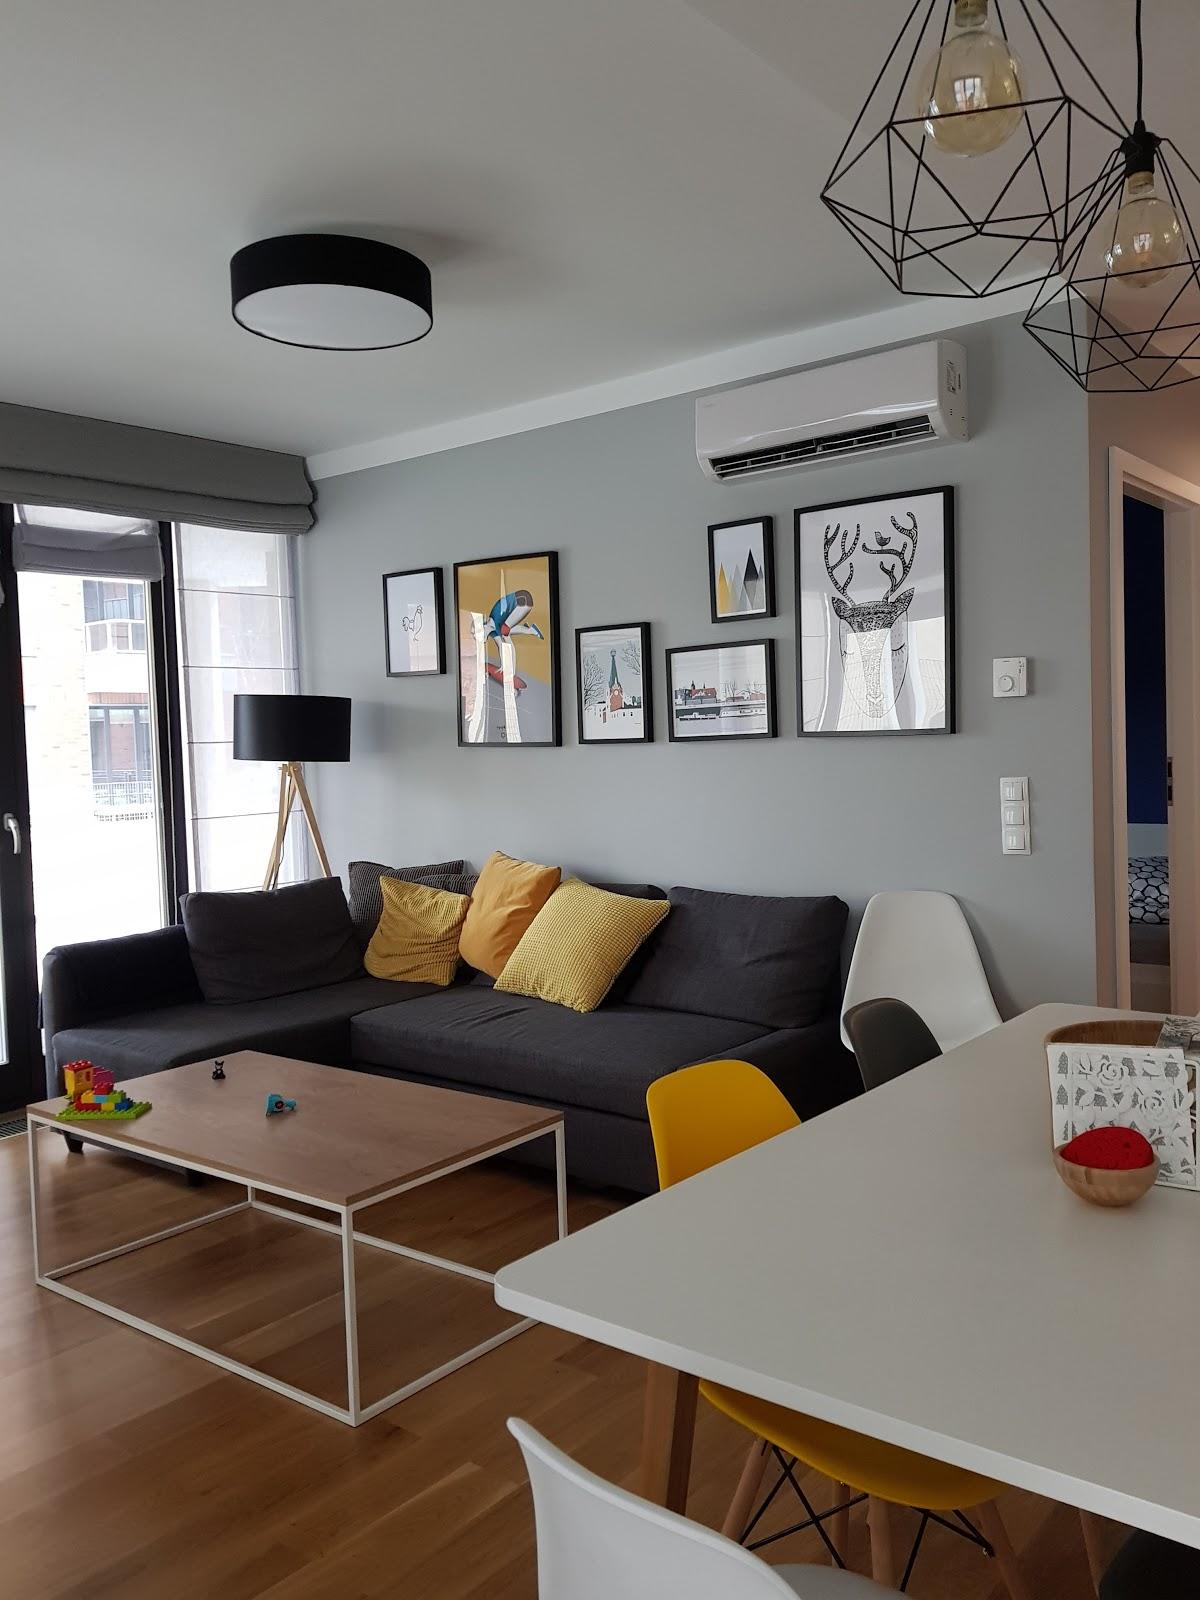 majoitus airbnb asunto